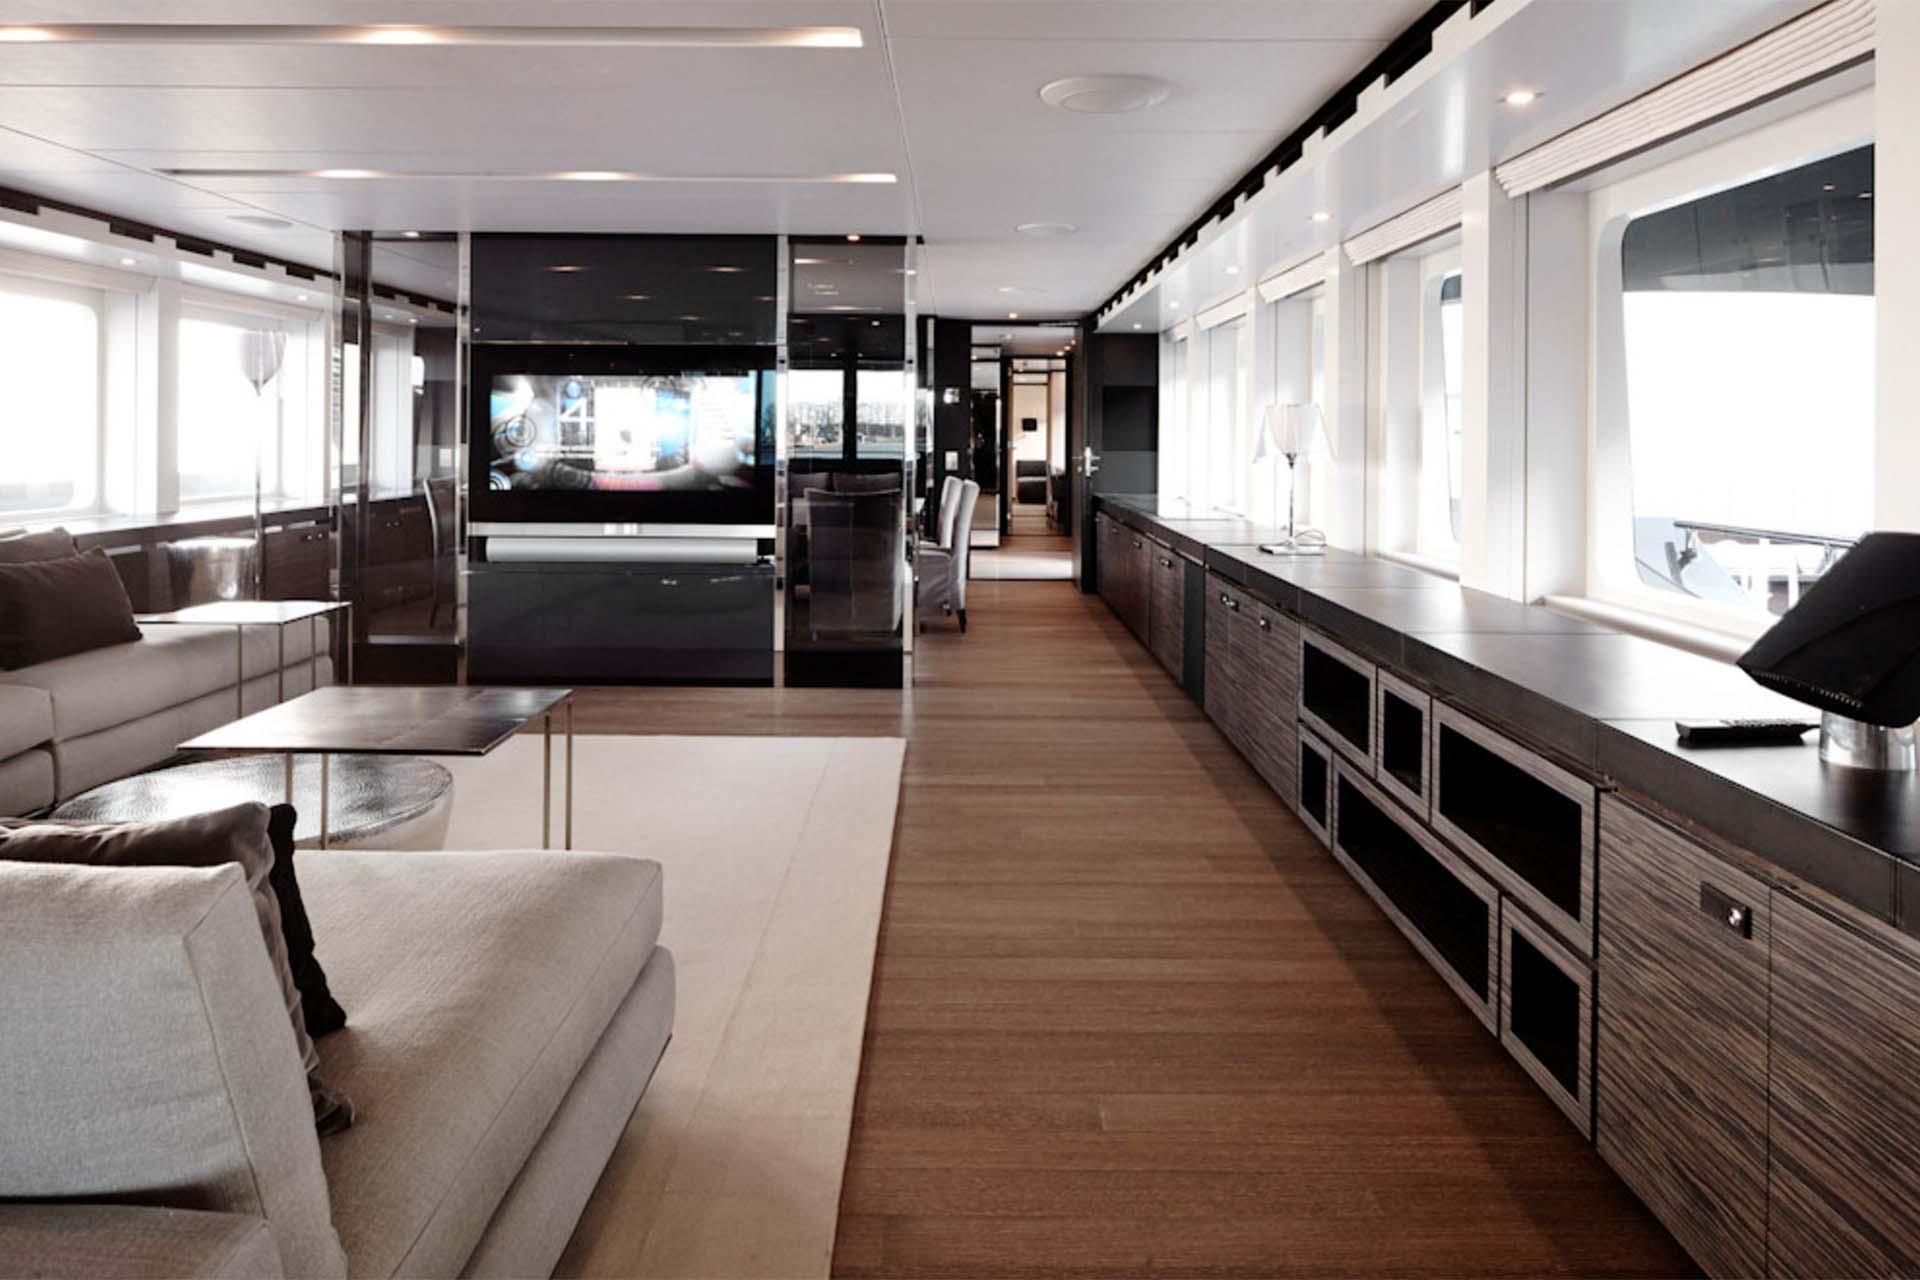 heesen - VENTURA - Paskowsky Yacht Design